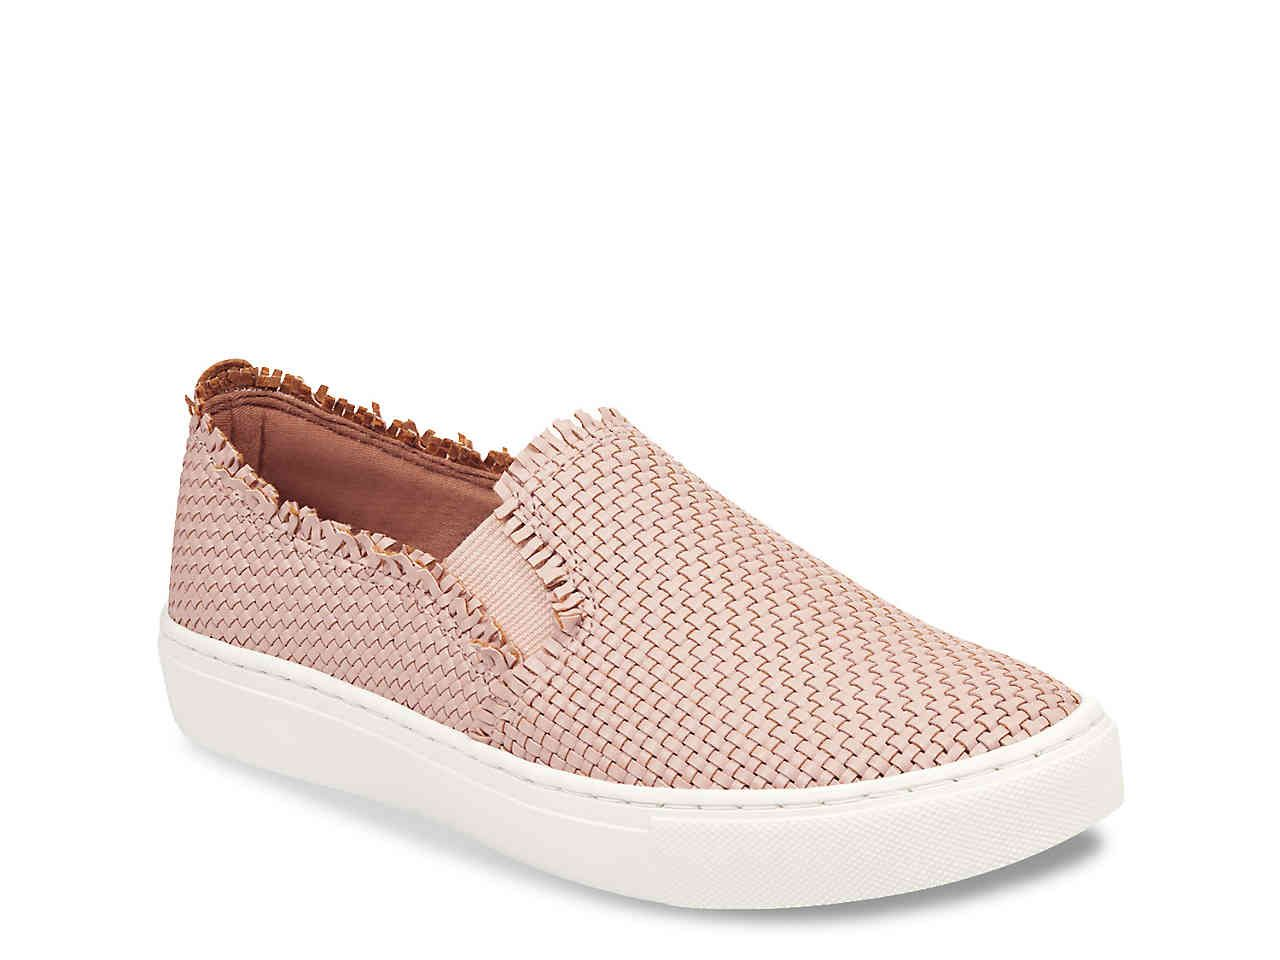 Indigo Rd. Kicky Slip-On Sneaker | Slip